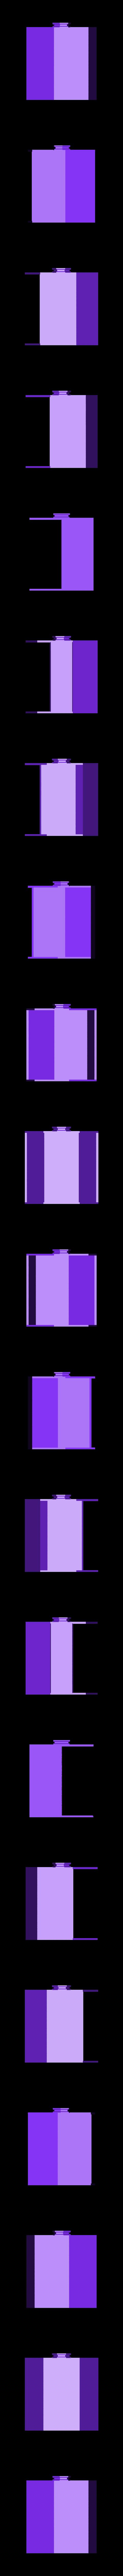 Hex_Drawer_LARGE.stl Download free STL file Modular Hex Drawers • Design to 3D print, O3D